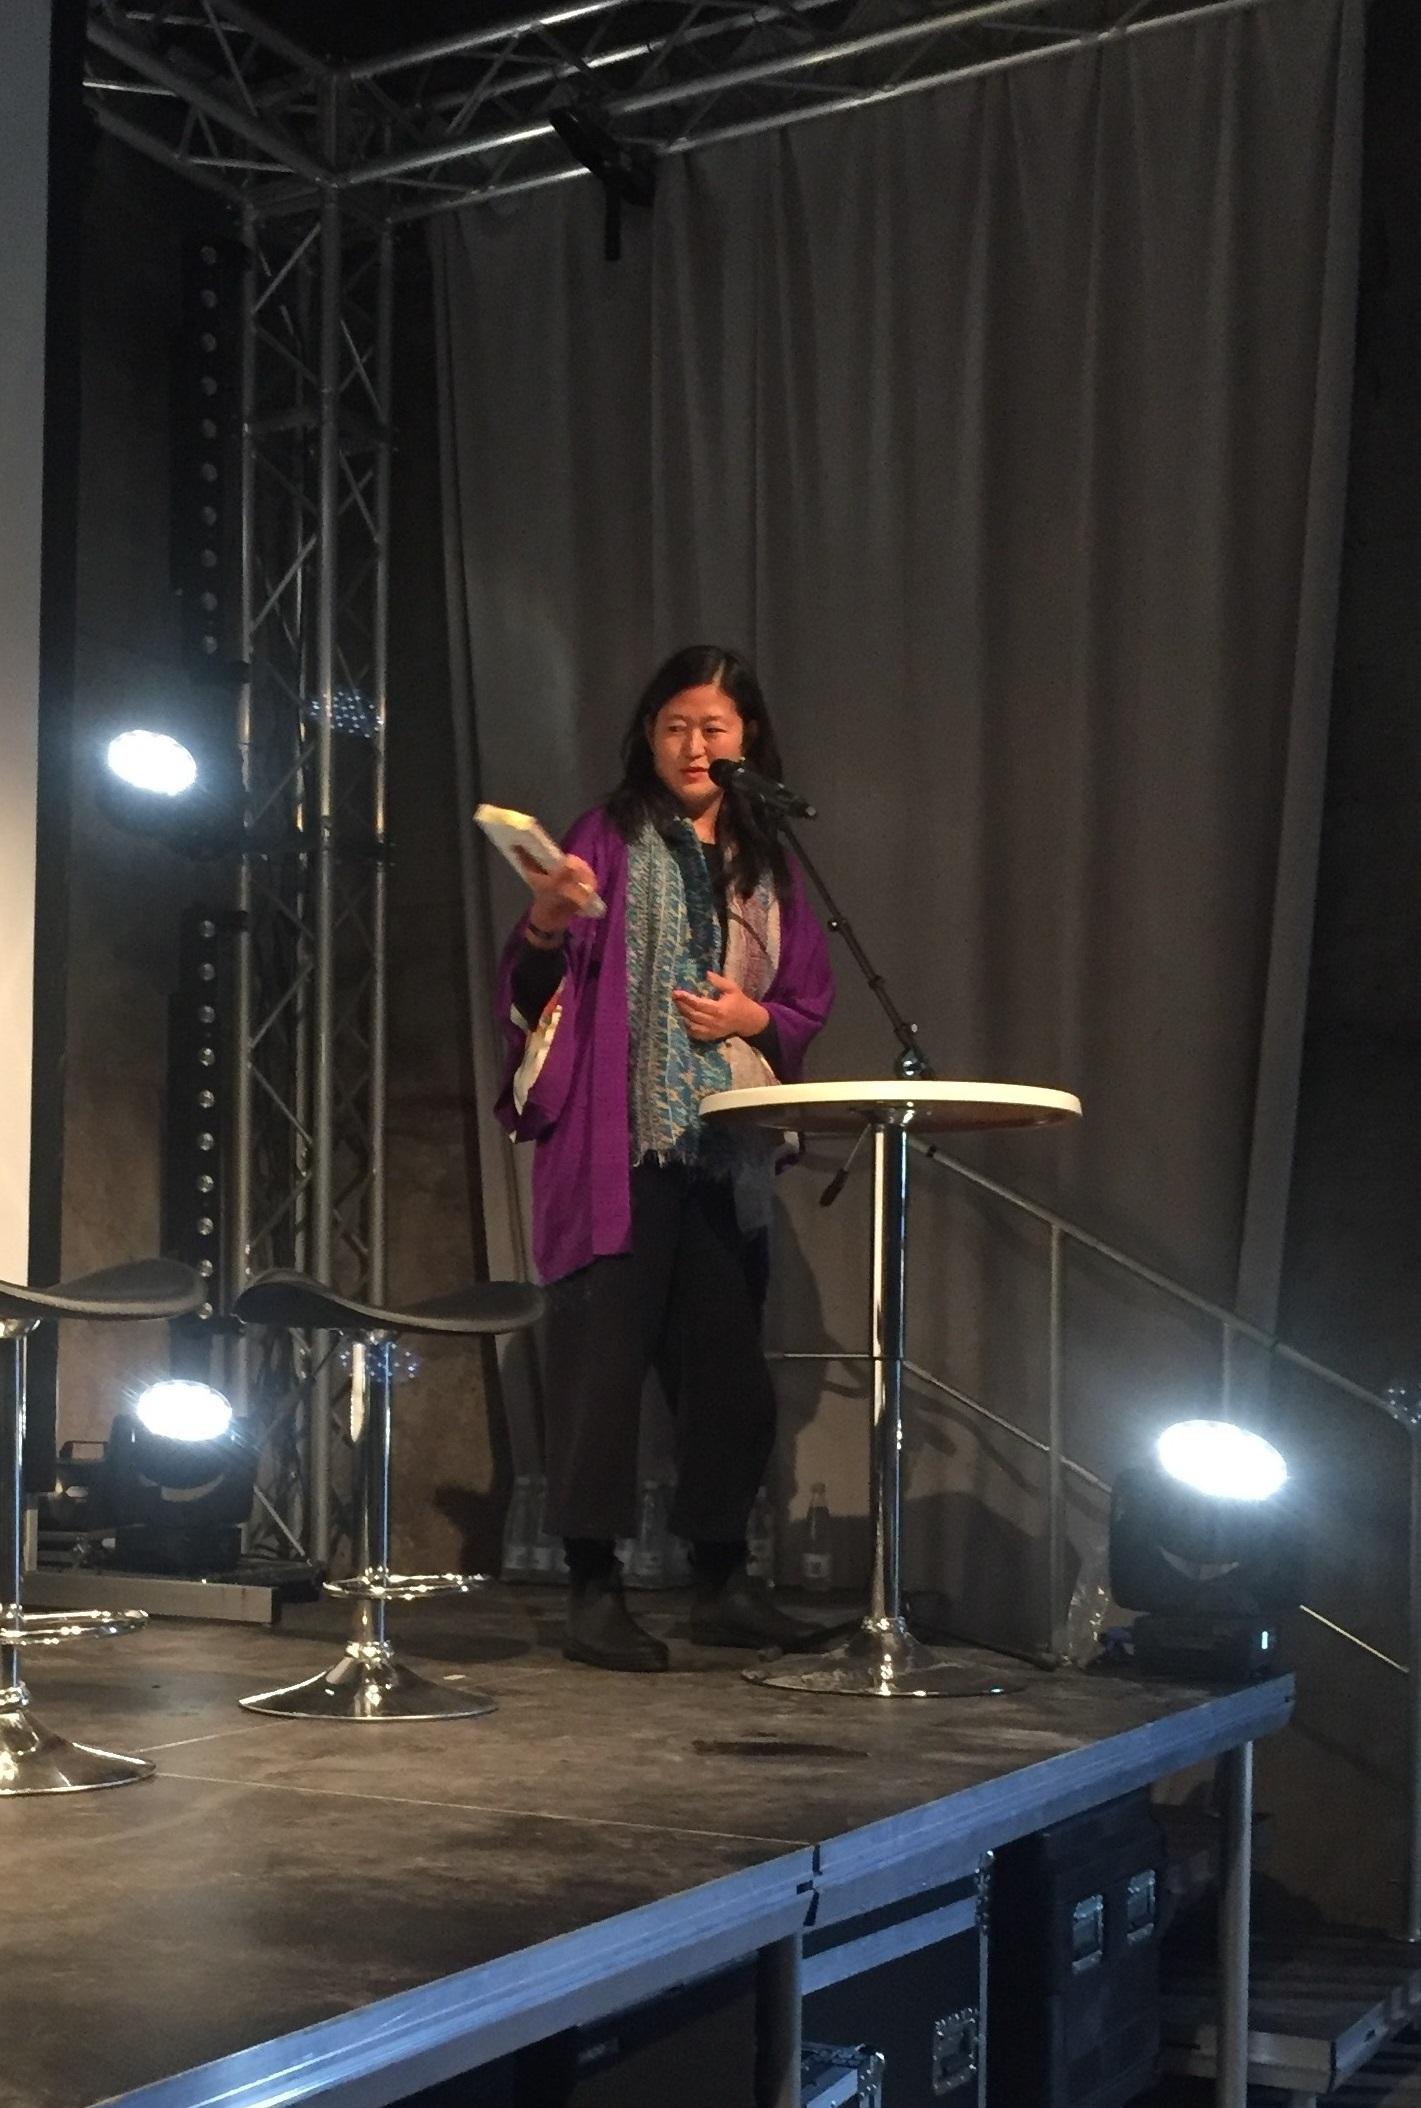 Eva Tind las upp úr skaldsøguni Ophav